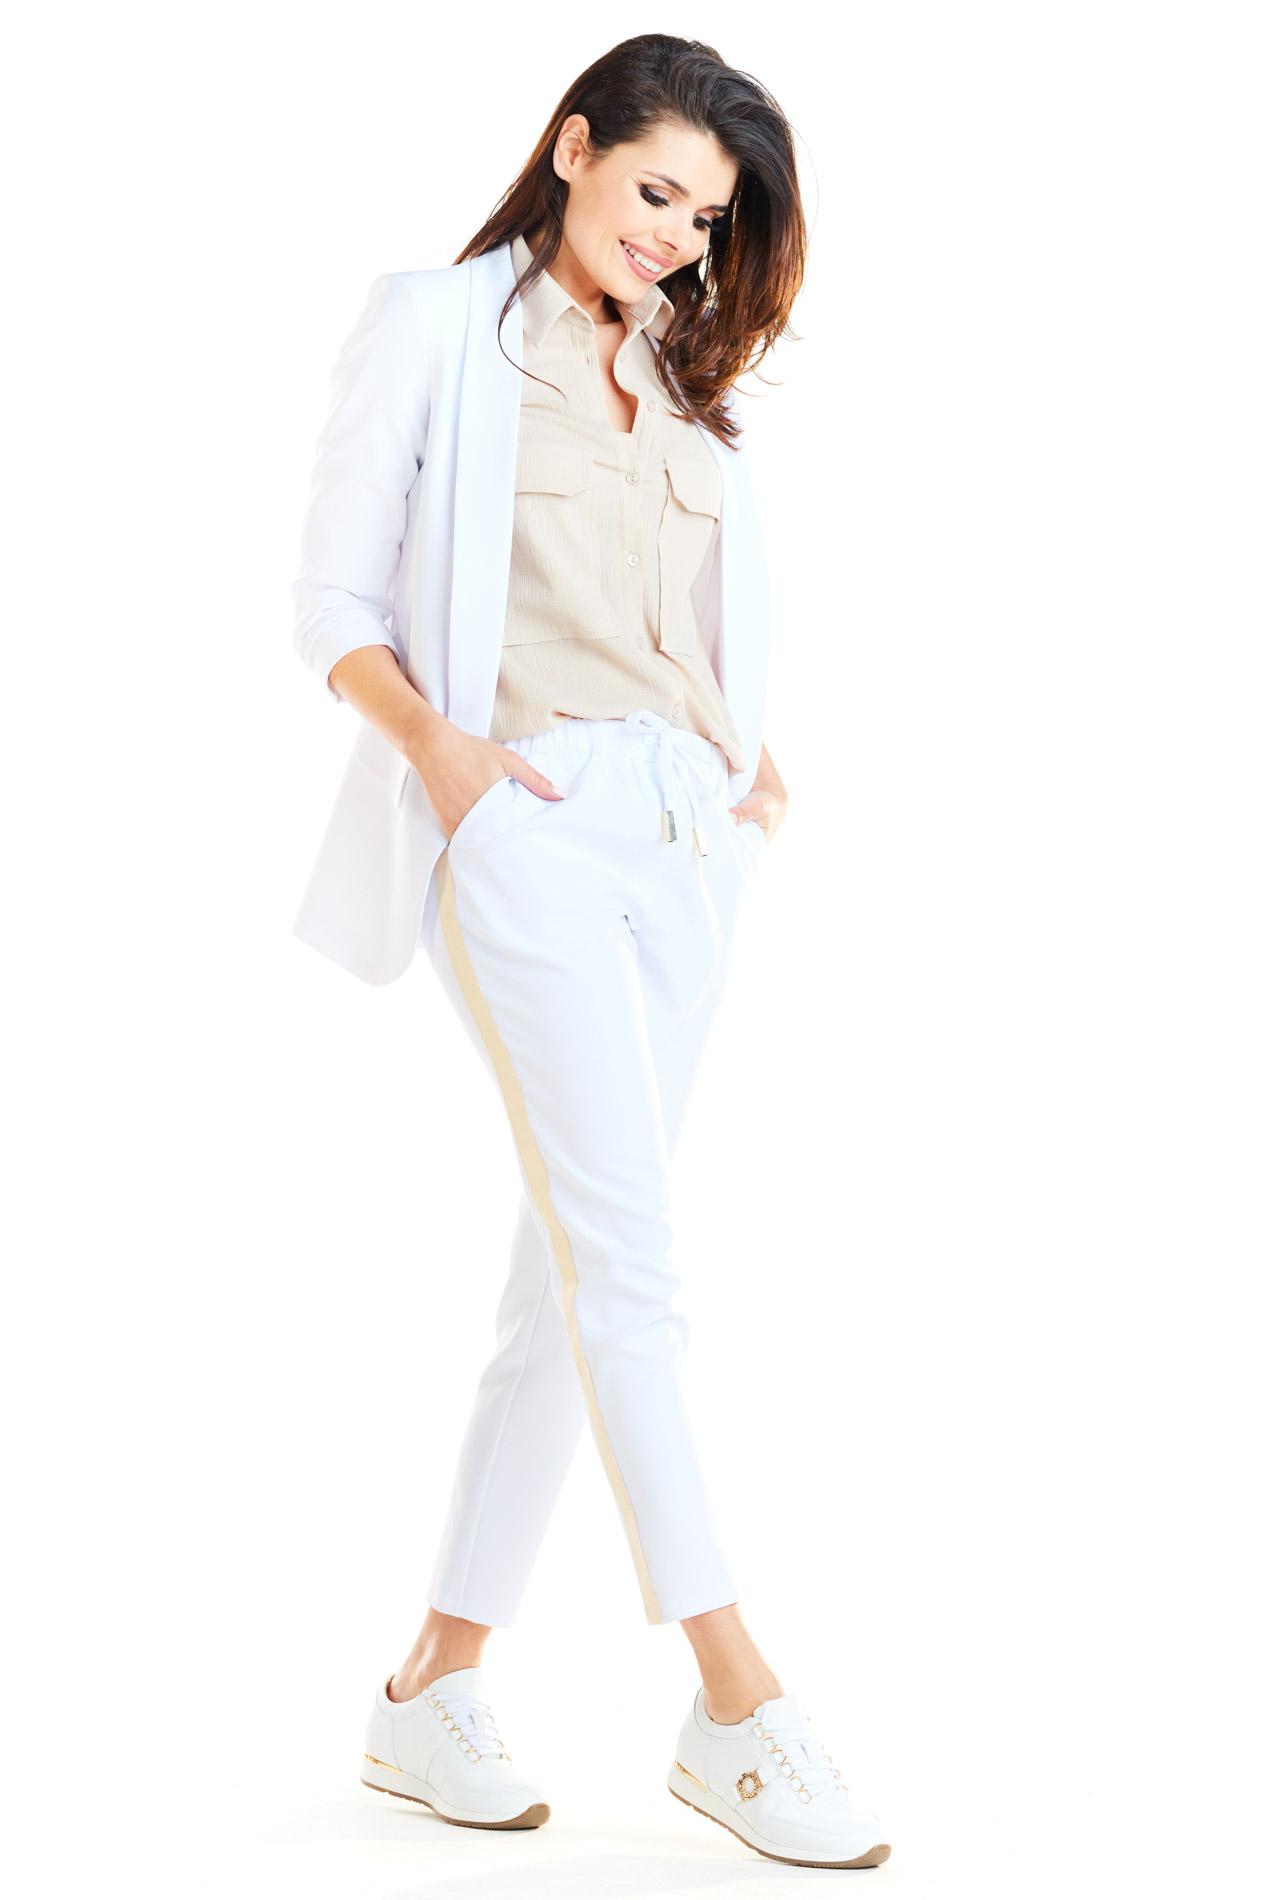 a258699cf9e2e CM4181 Casualowe spodnie na co dzień - białe ...